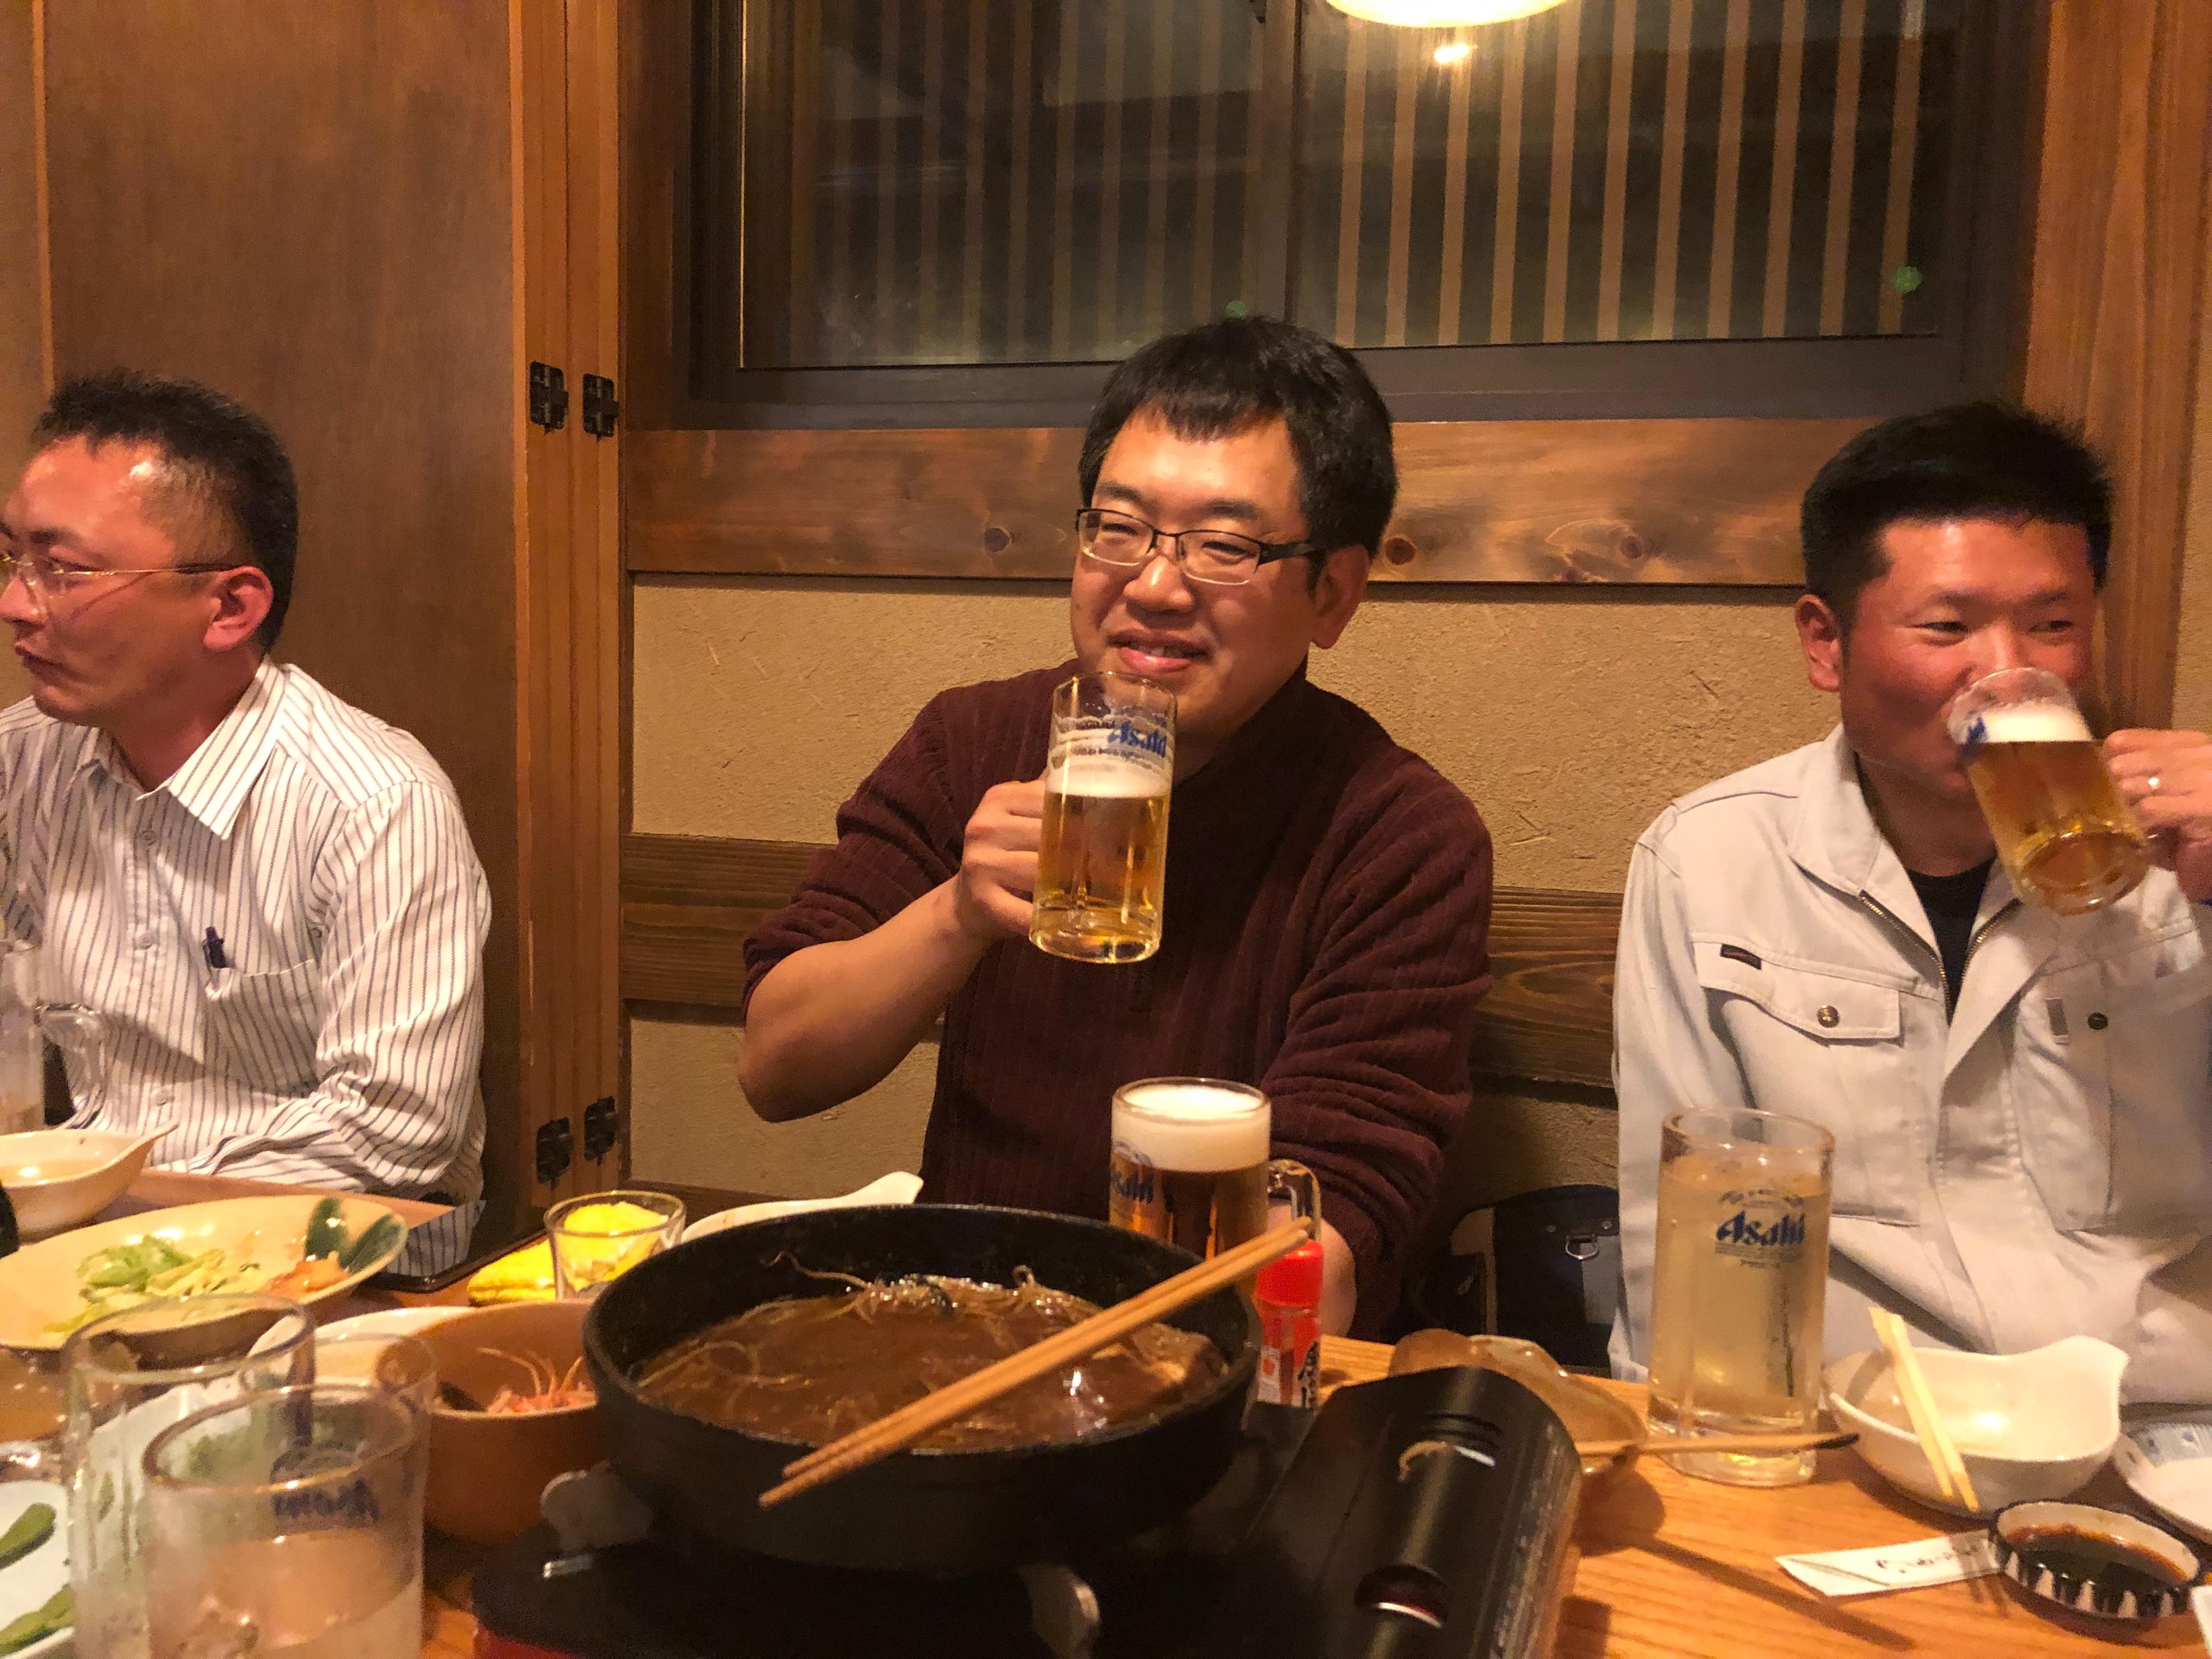 f:id:masanori-kato1972:20190326104242j:image